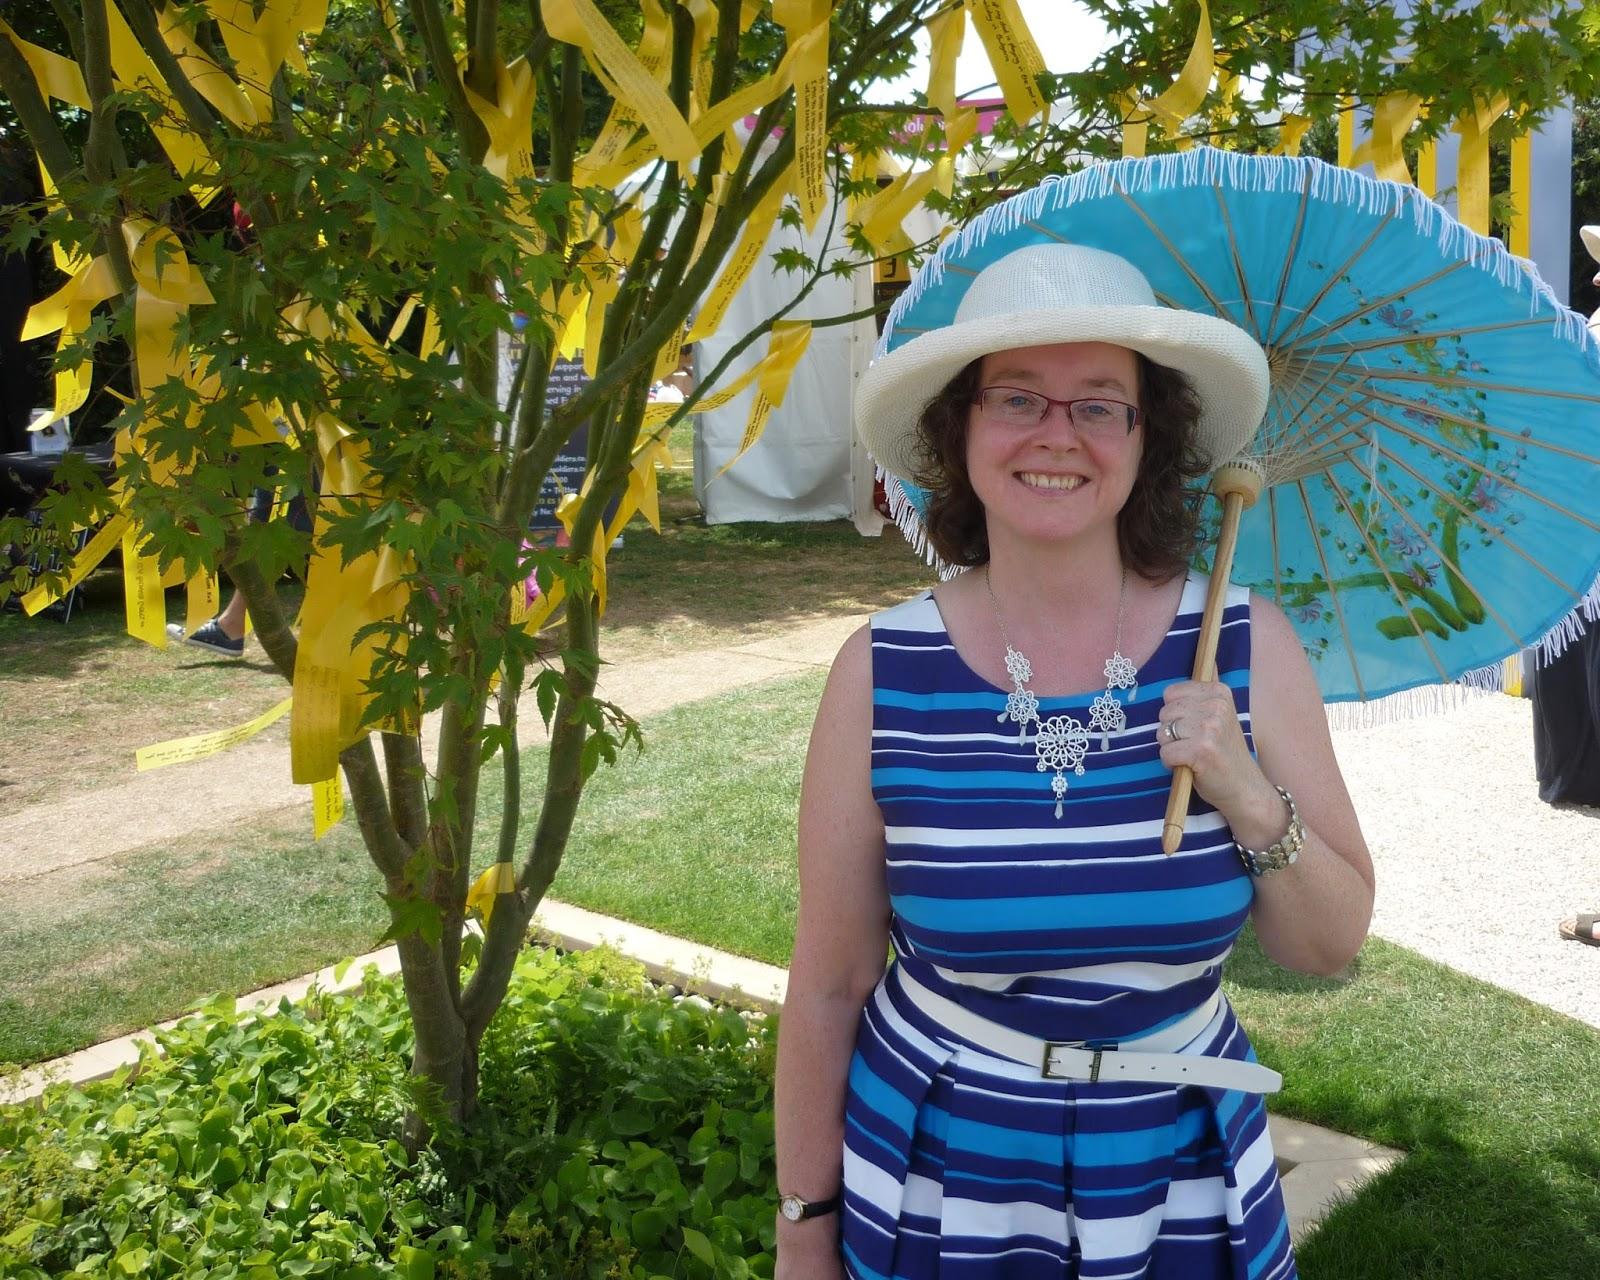 Dress and Blue Parasol; PetiteSilverVixen